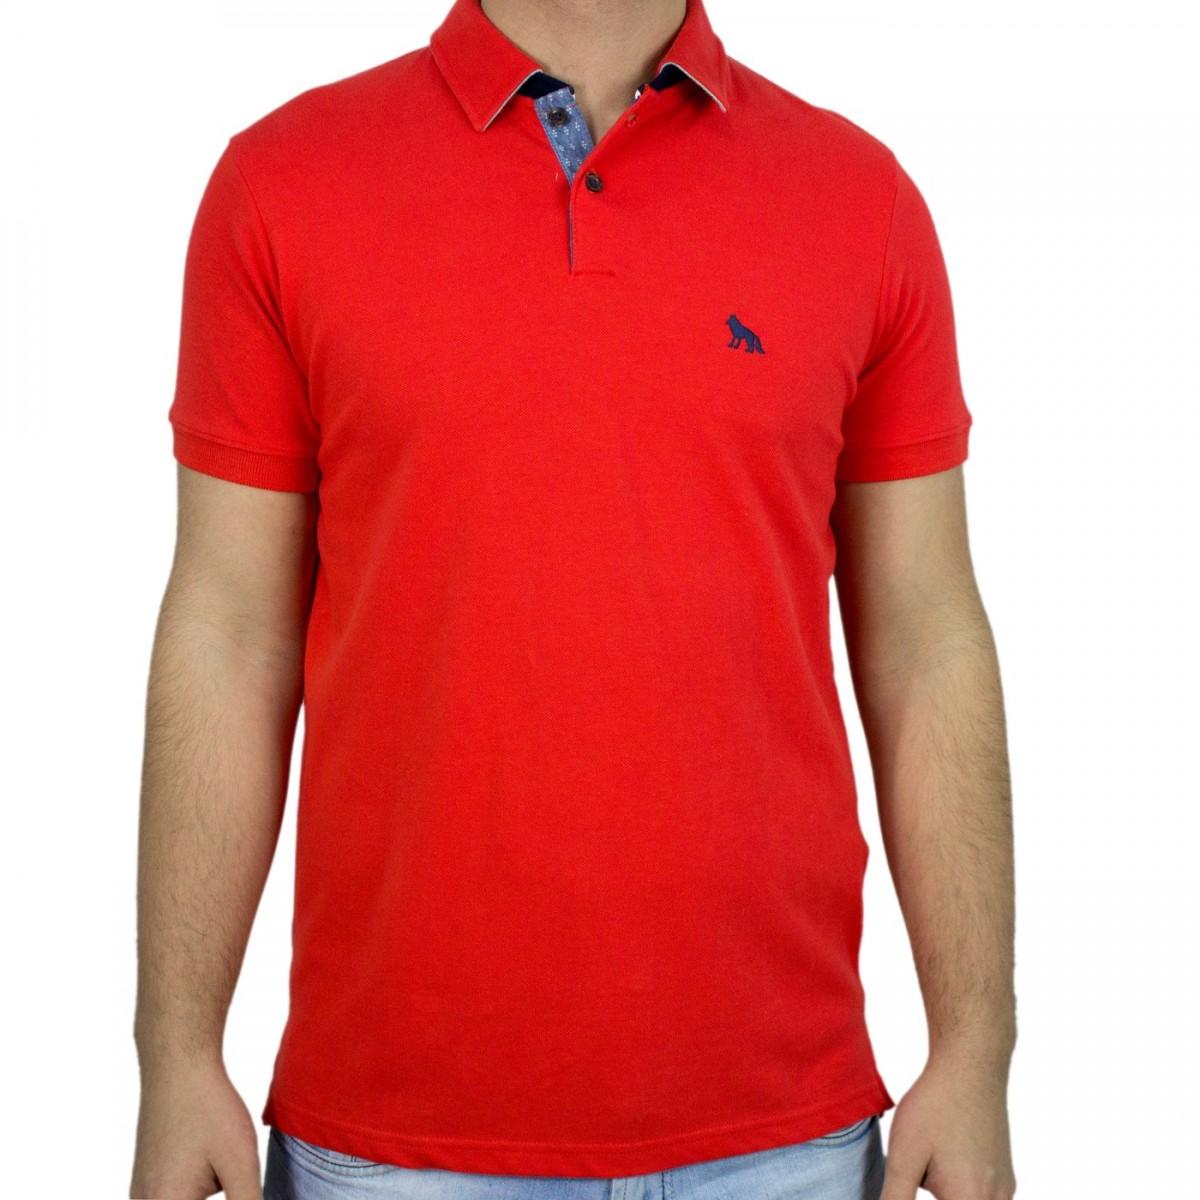 cd33d2ab35 Bizz Store - Camisa Polo Masculina Acostamento Manga Curta